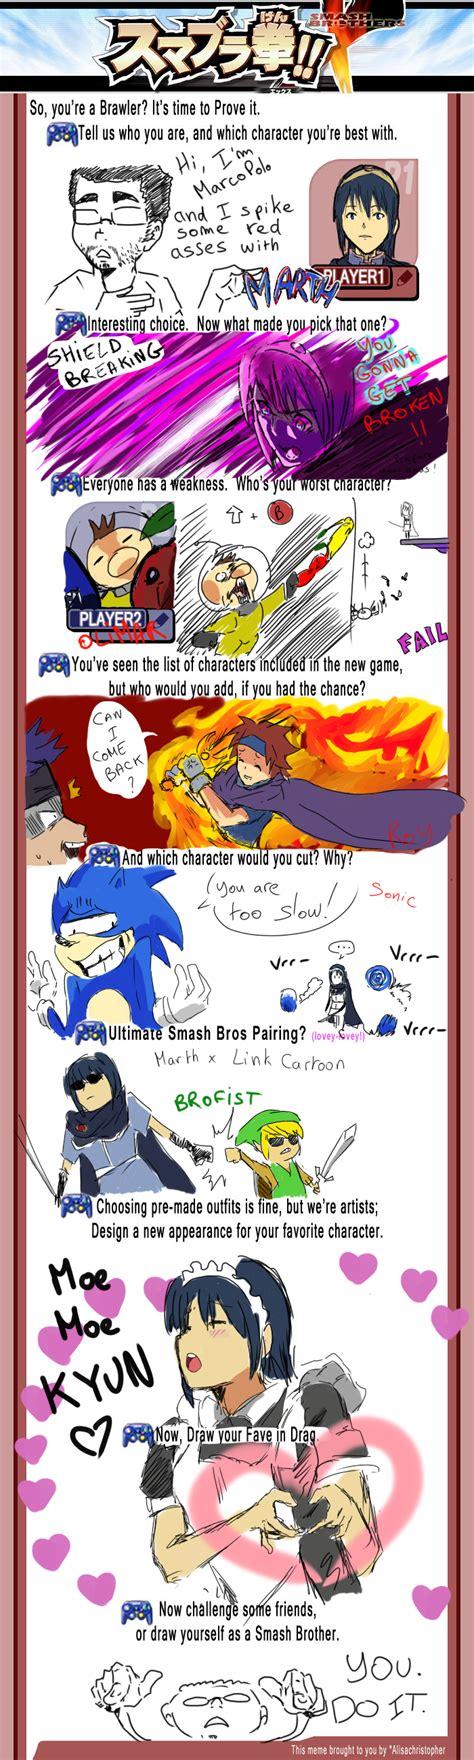 Smash Bros Memes - smash bros brawl meme by doodlerush on deviantart